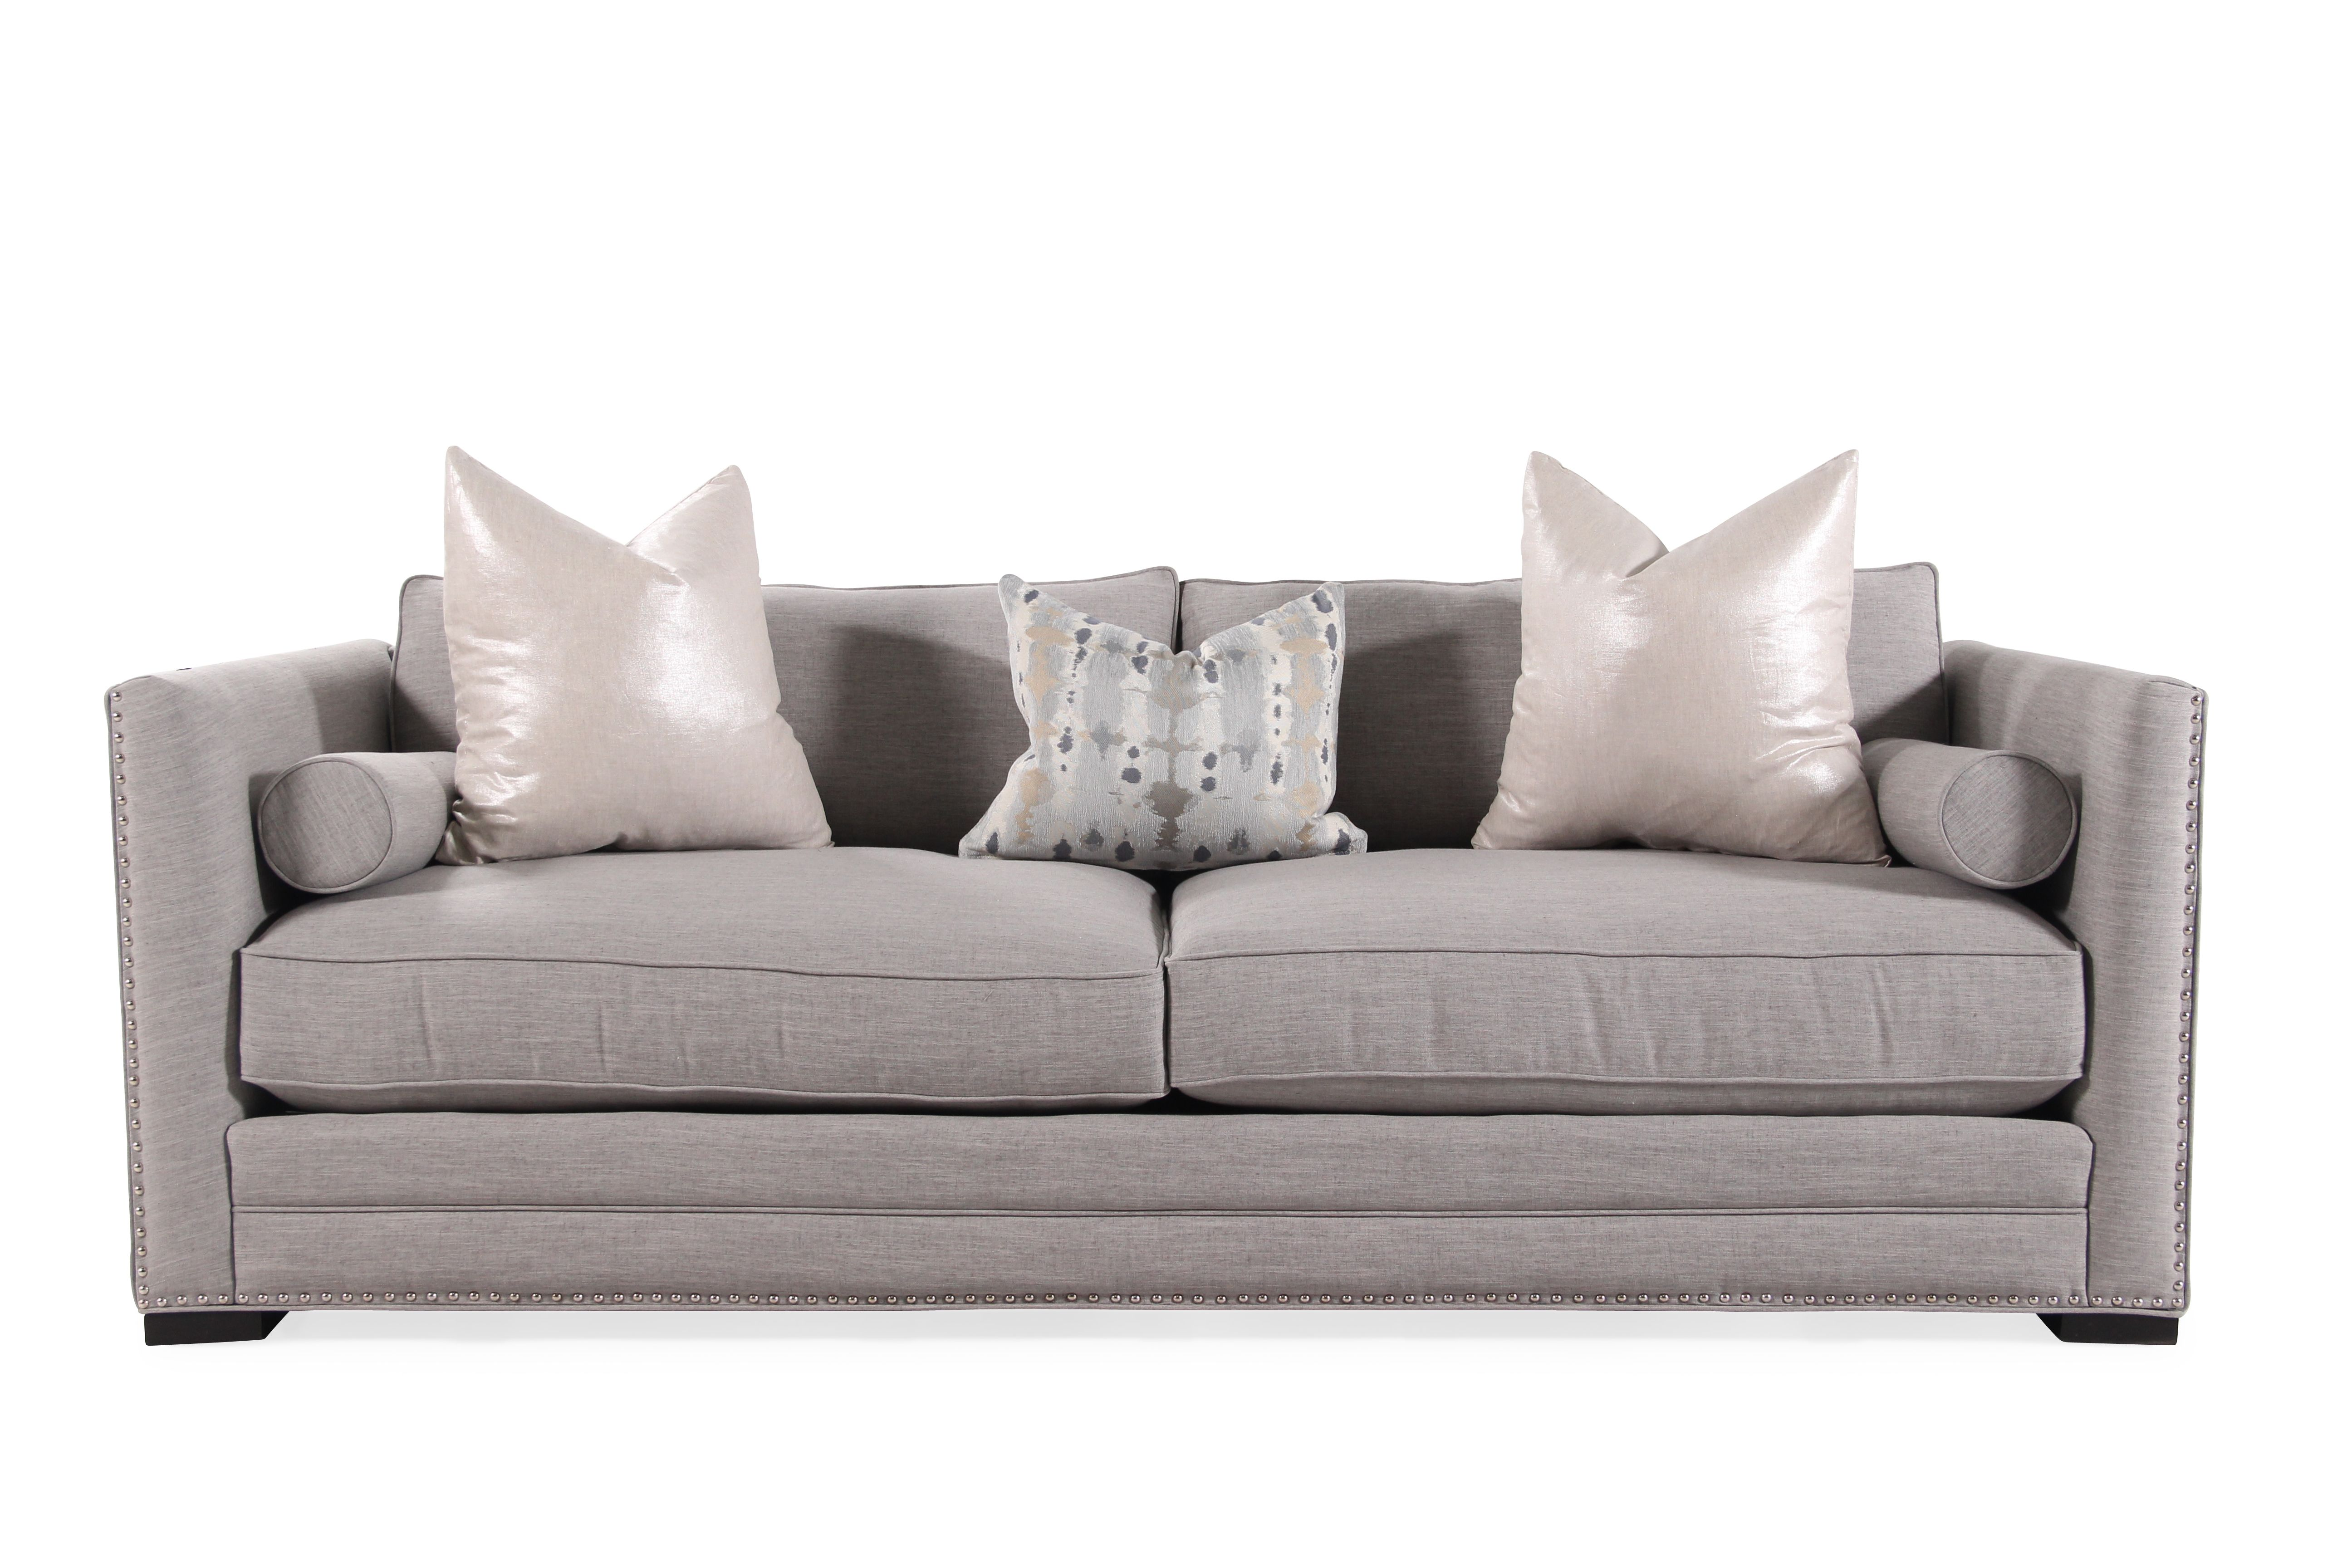 Astonishing Jonathan Louis Hurston Estate Sofa Mathis Brothers Pdpeps Interior Chair Design Pdpepsorg